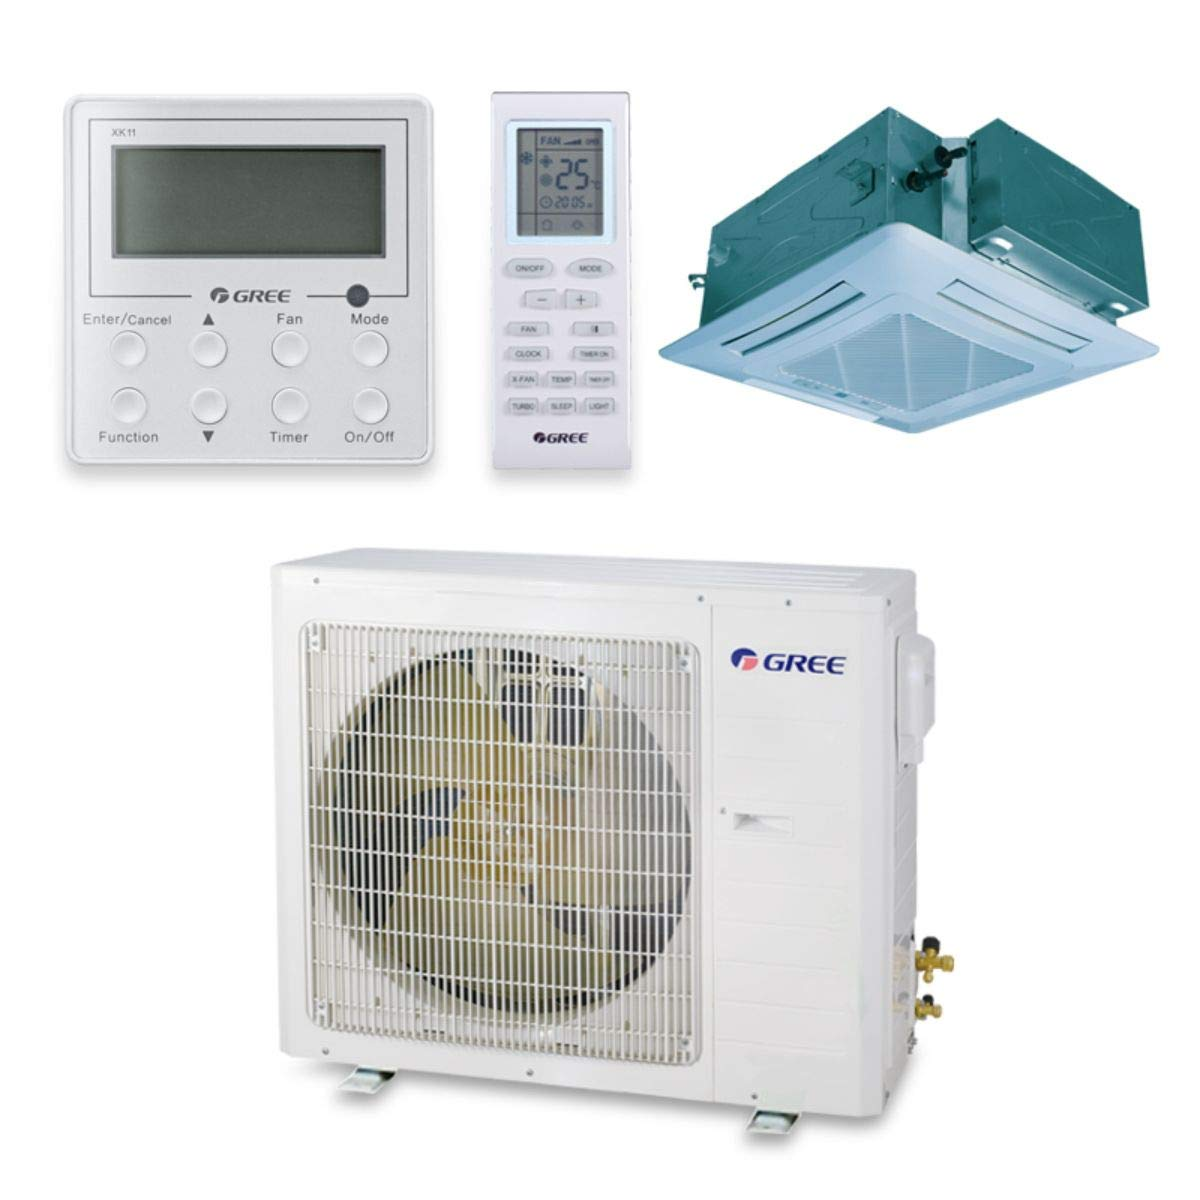 Gree UMAT18HP230V1AC-S - 18,000 BTU 16 SEER Ceiling Cassette Ductless Mini Split Air Conditioner Heat Pump 208-230V